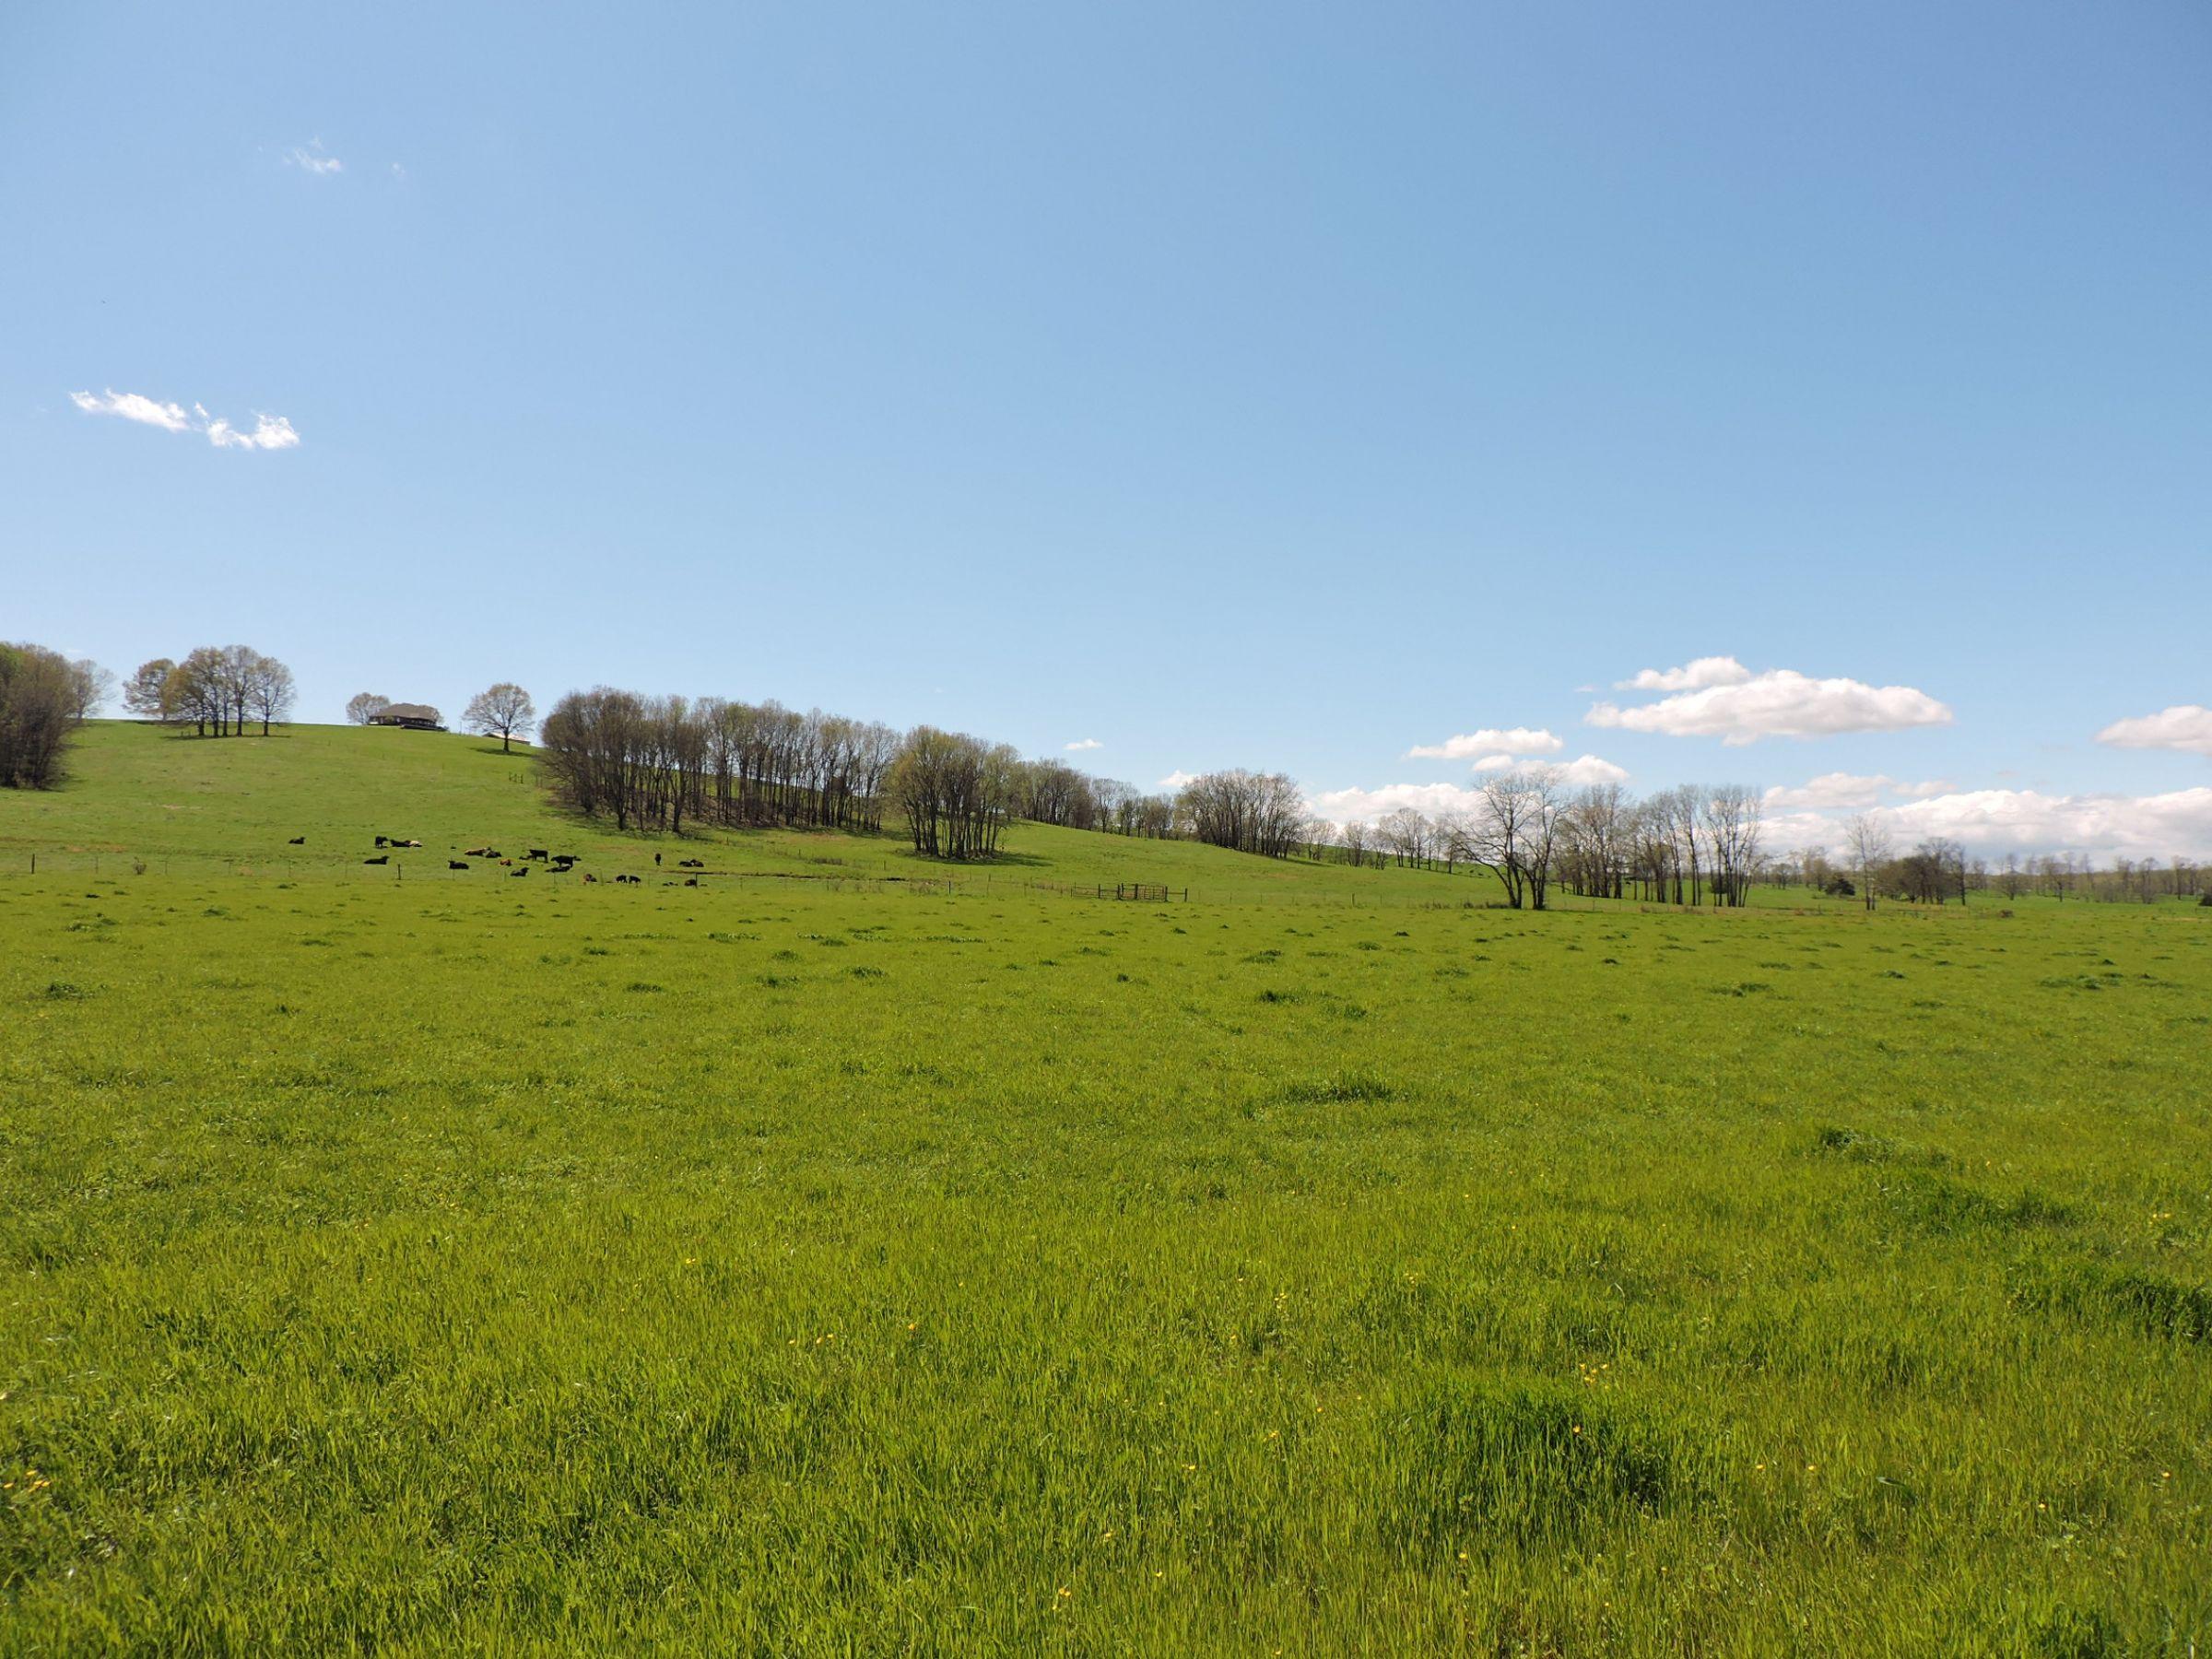 land-sharp-county-arkansas-695-acres-listing-number-15405-13-2021-04-13-213614.JPG